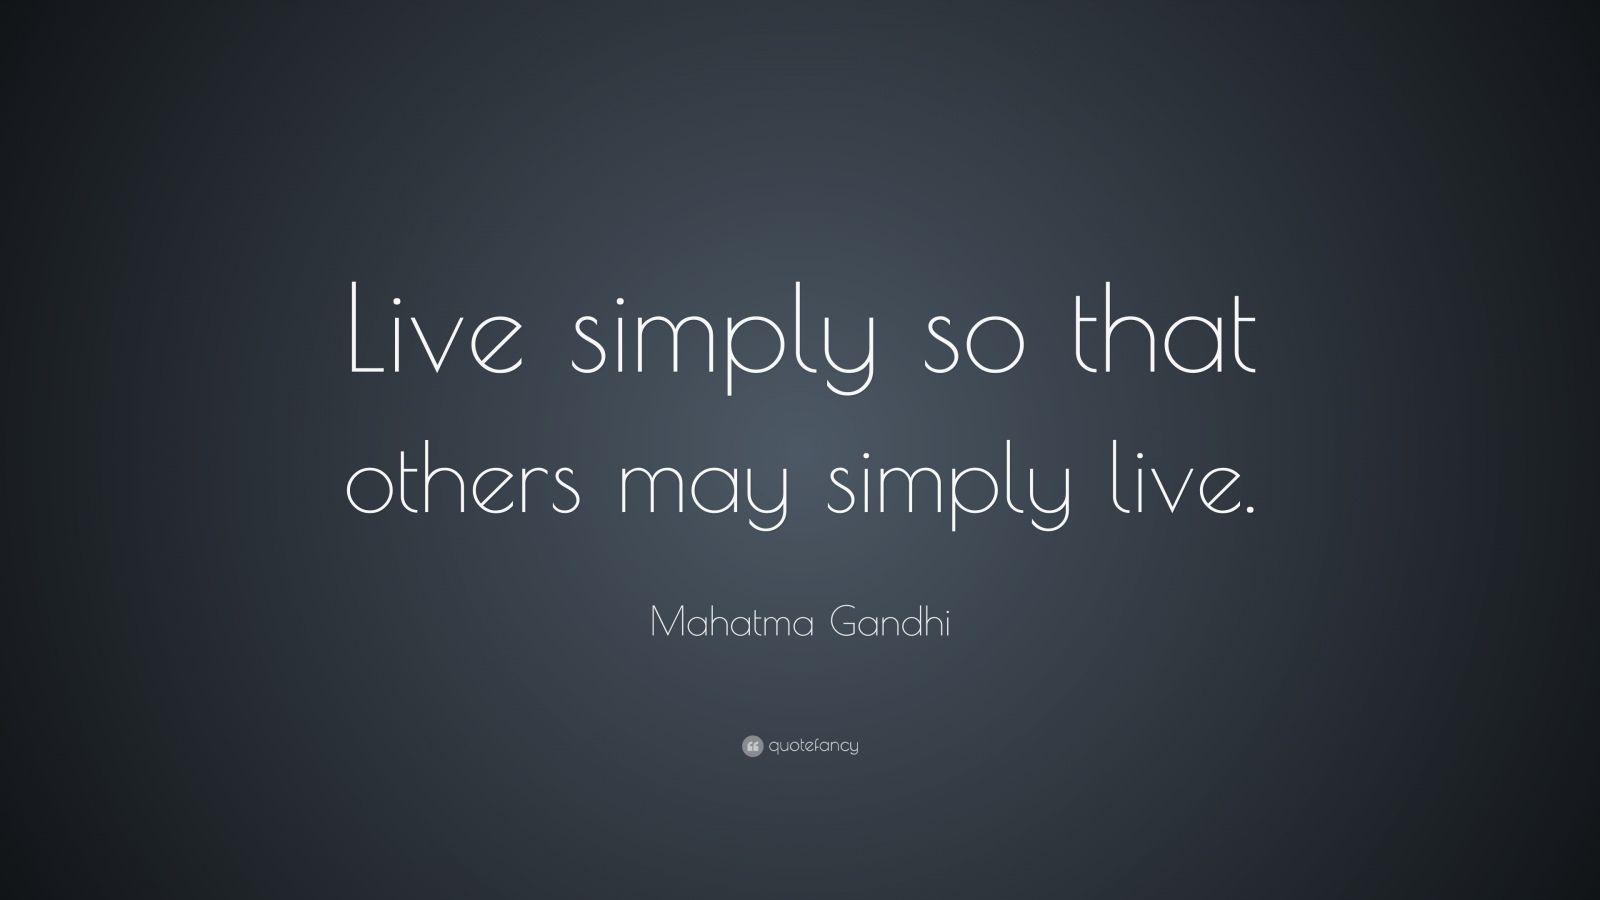 gandhi quotes wallpaper - photo #20